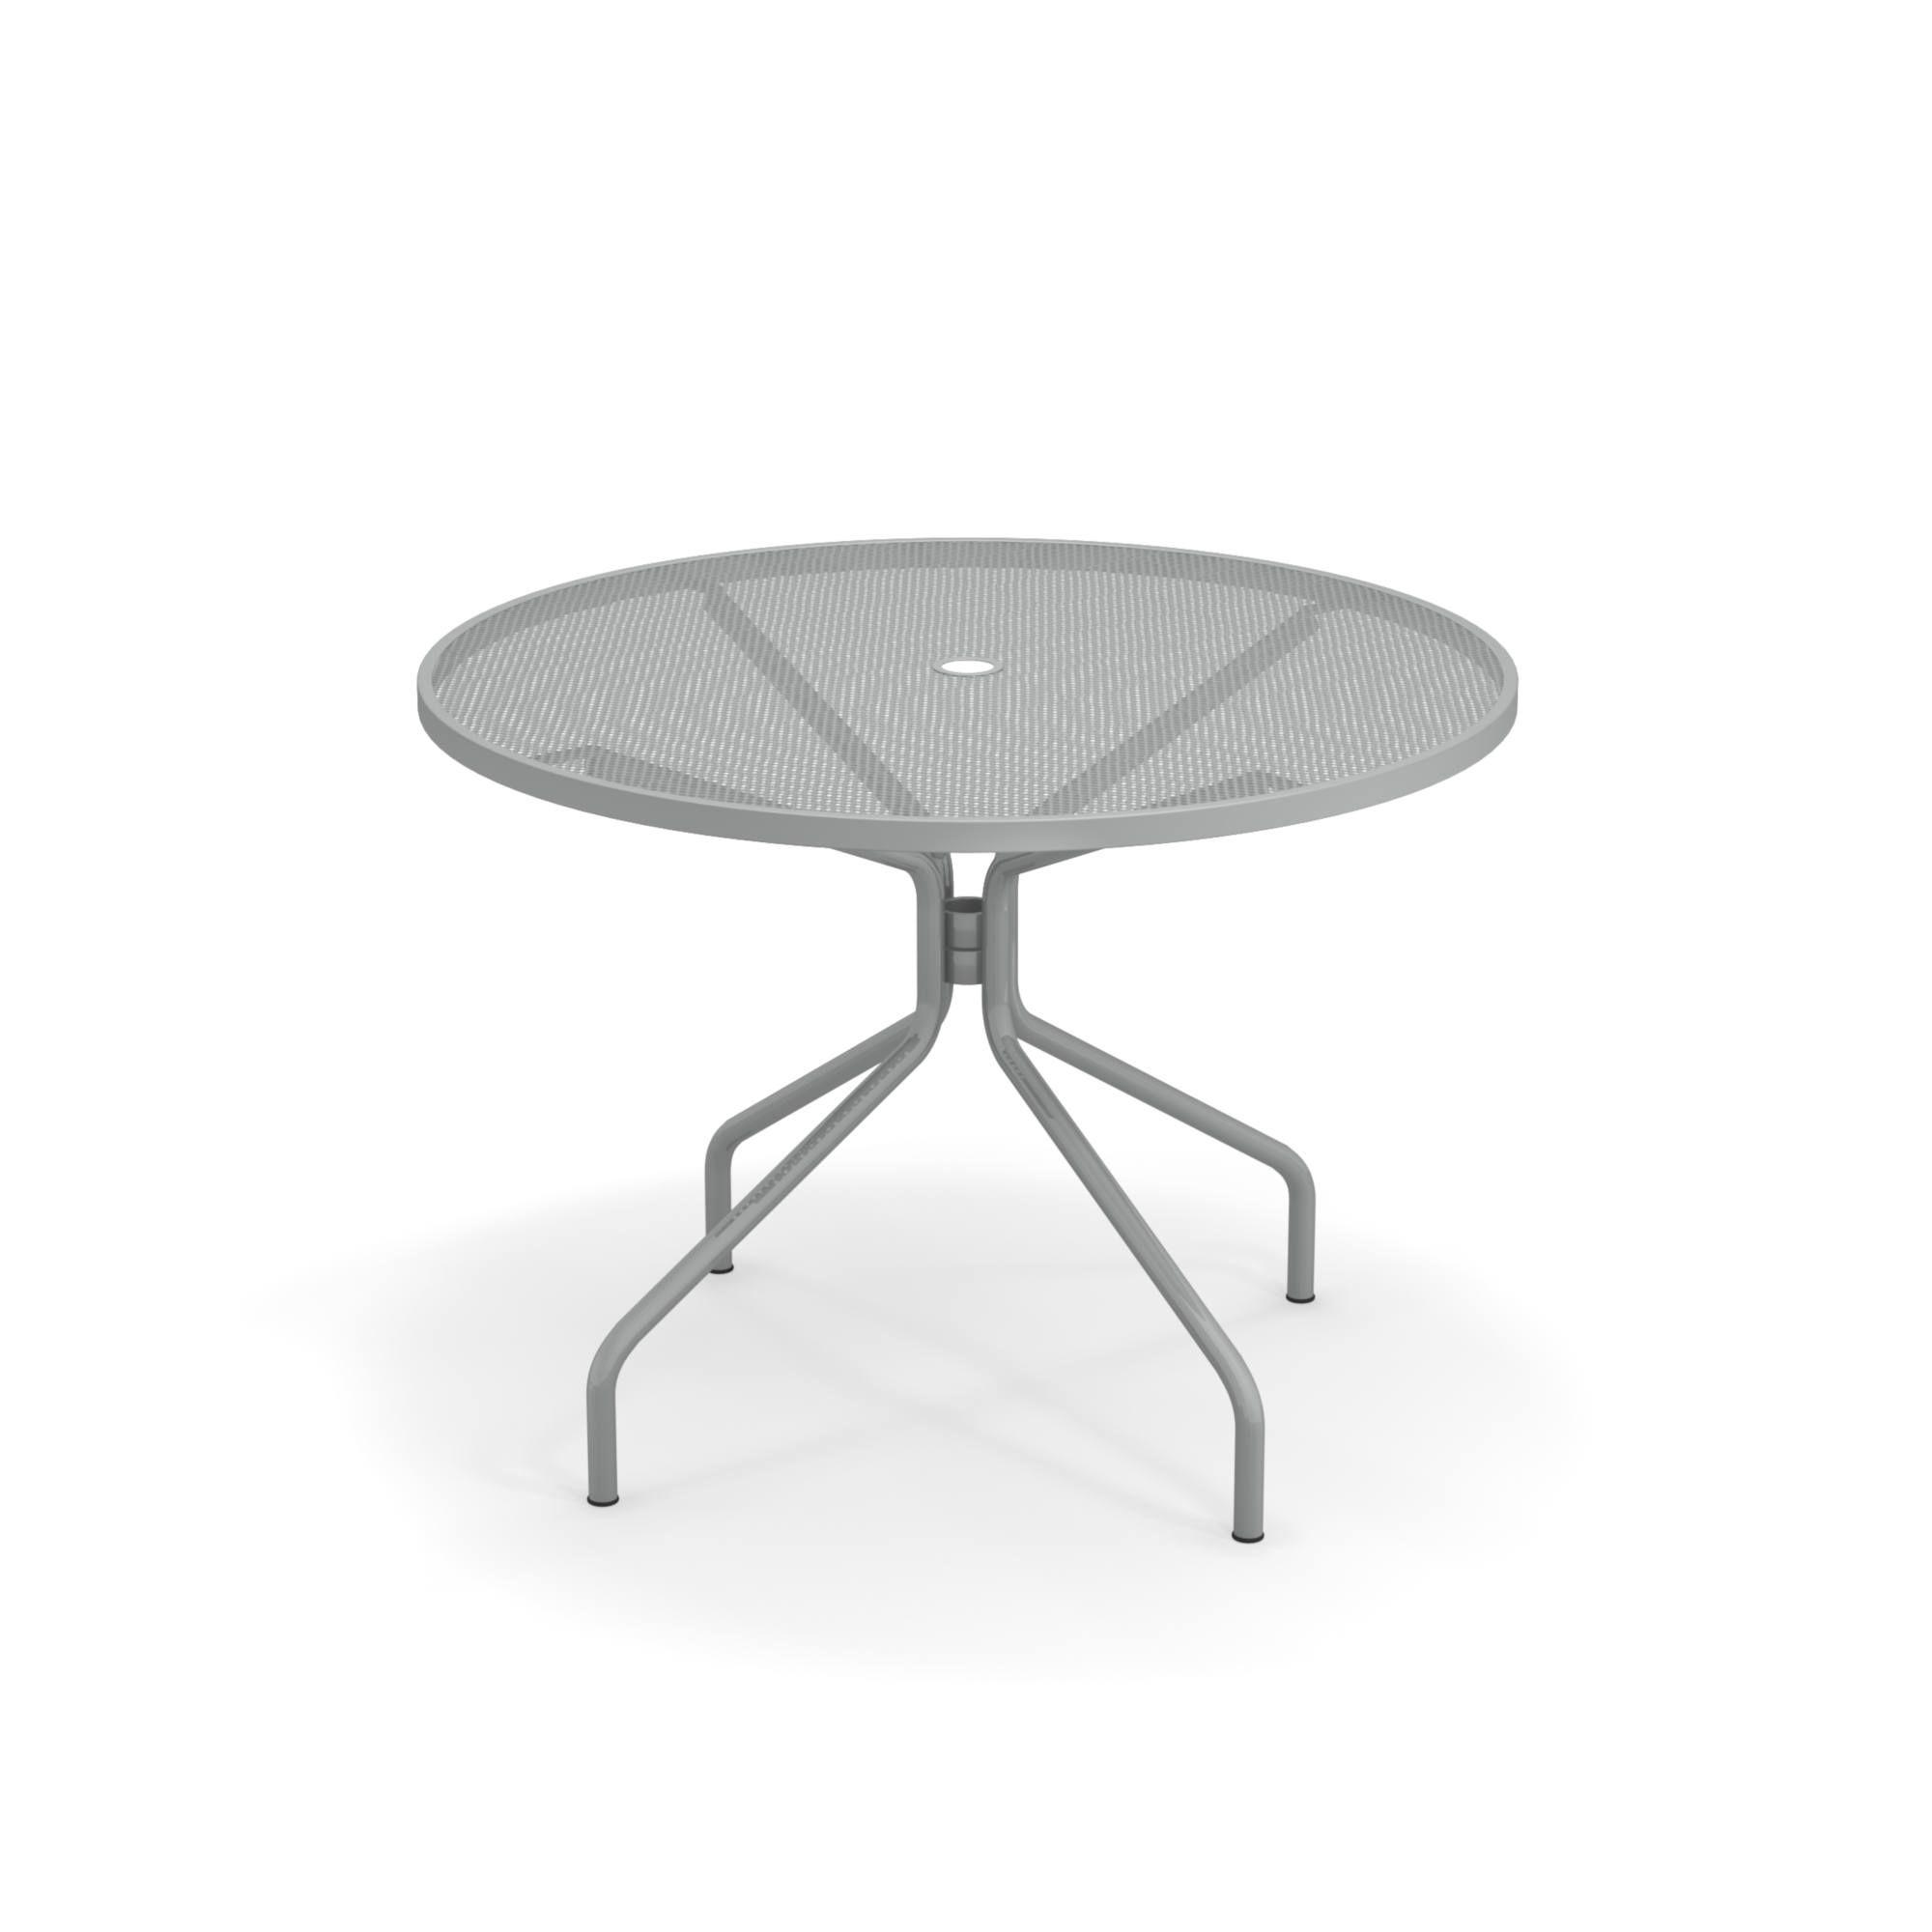 emuamericas, llc 804-20 table, outdoor